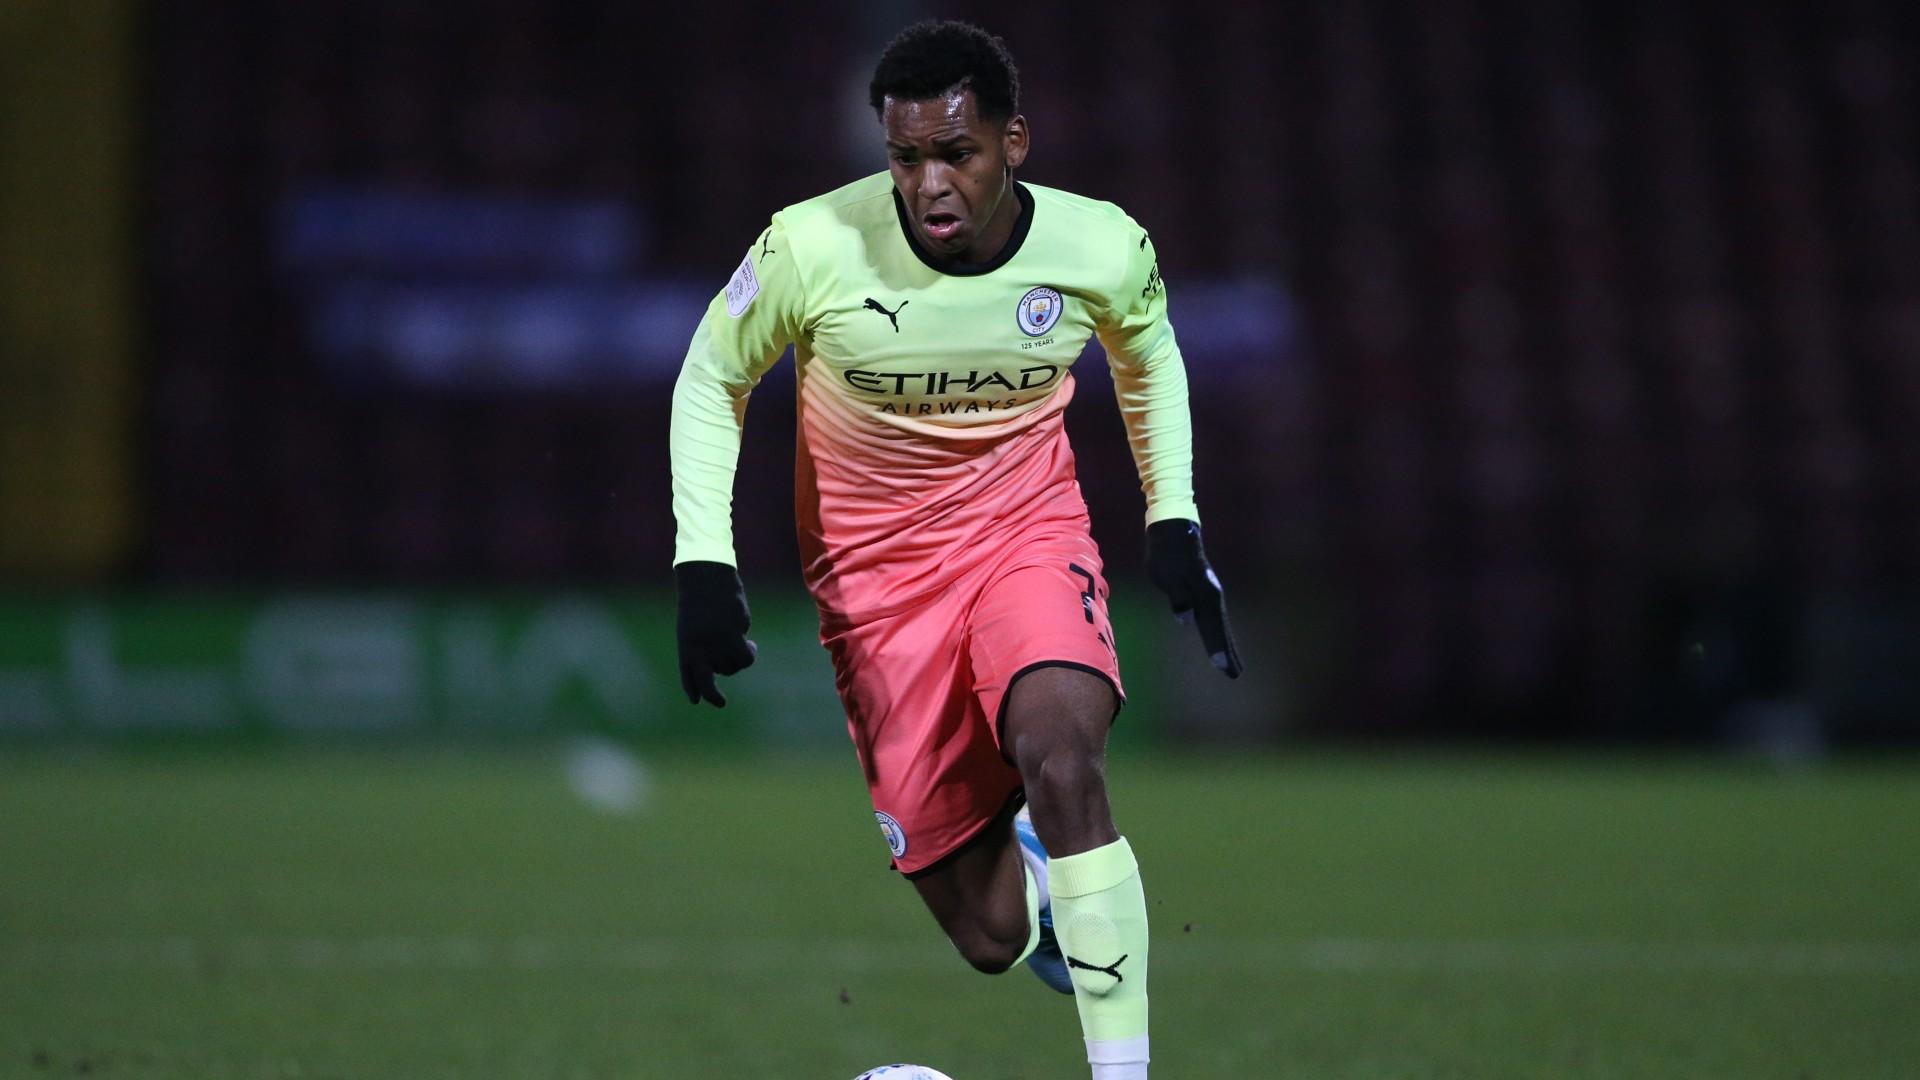 Manchester City winger Braaf joins Udinese on loan until end of season